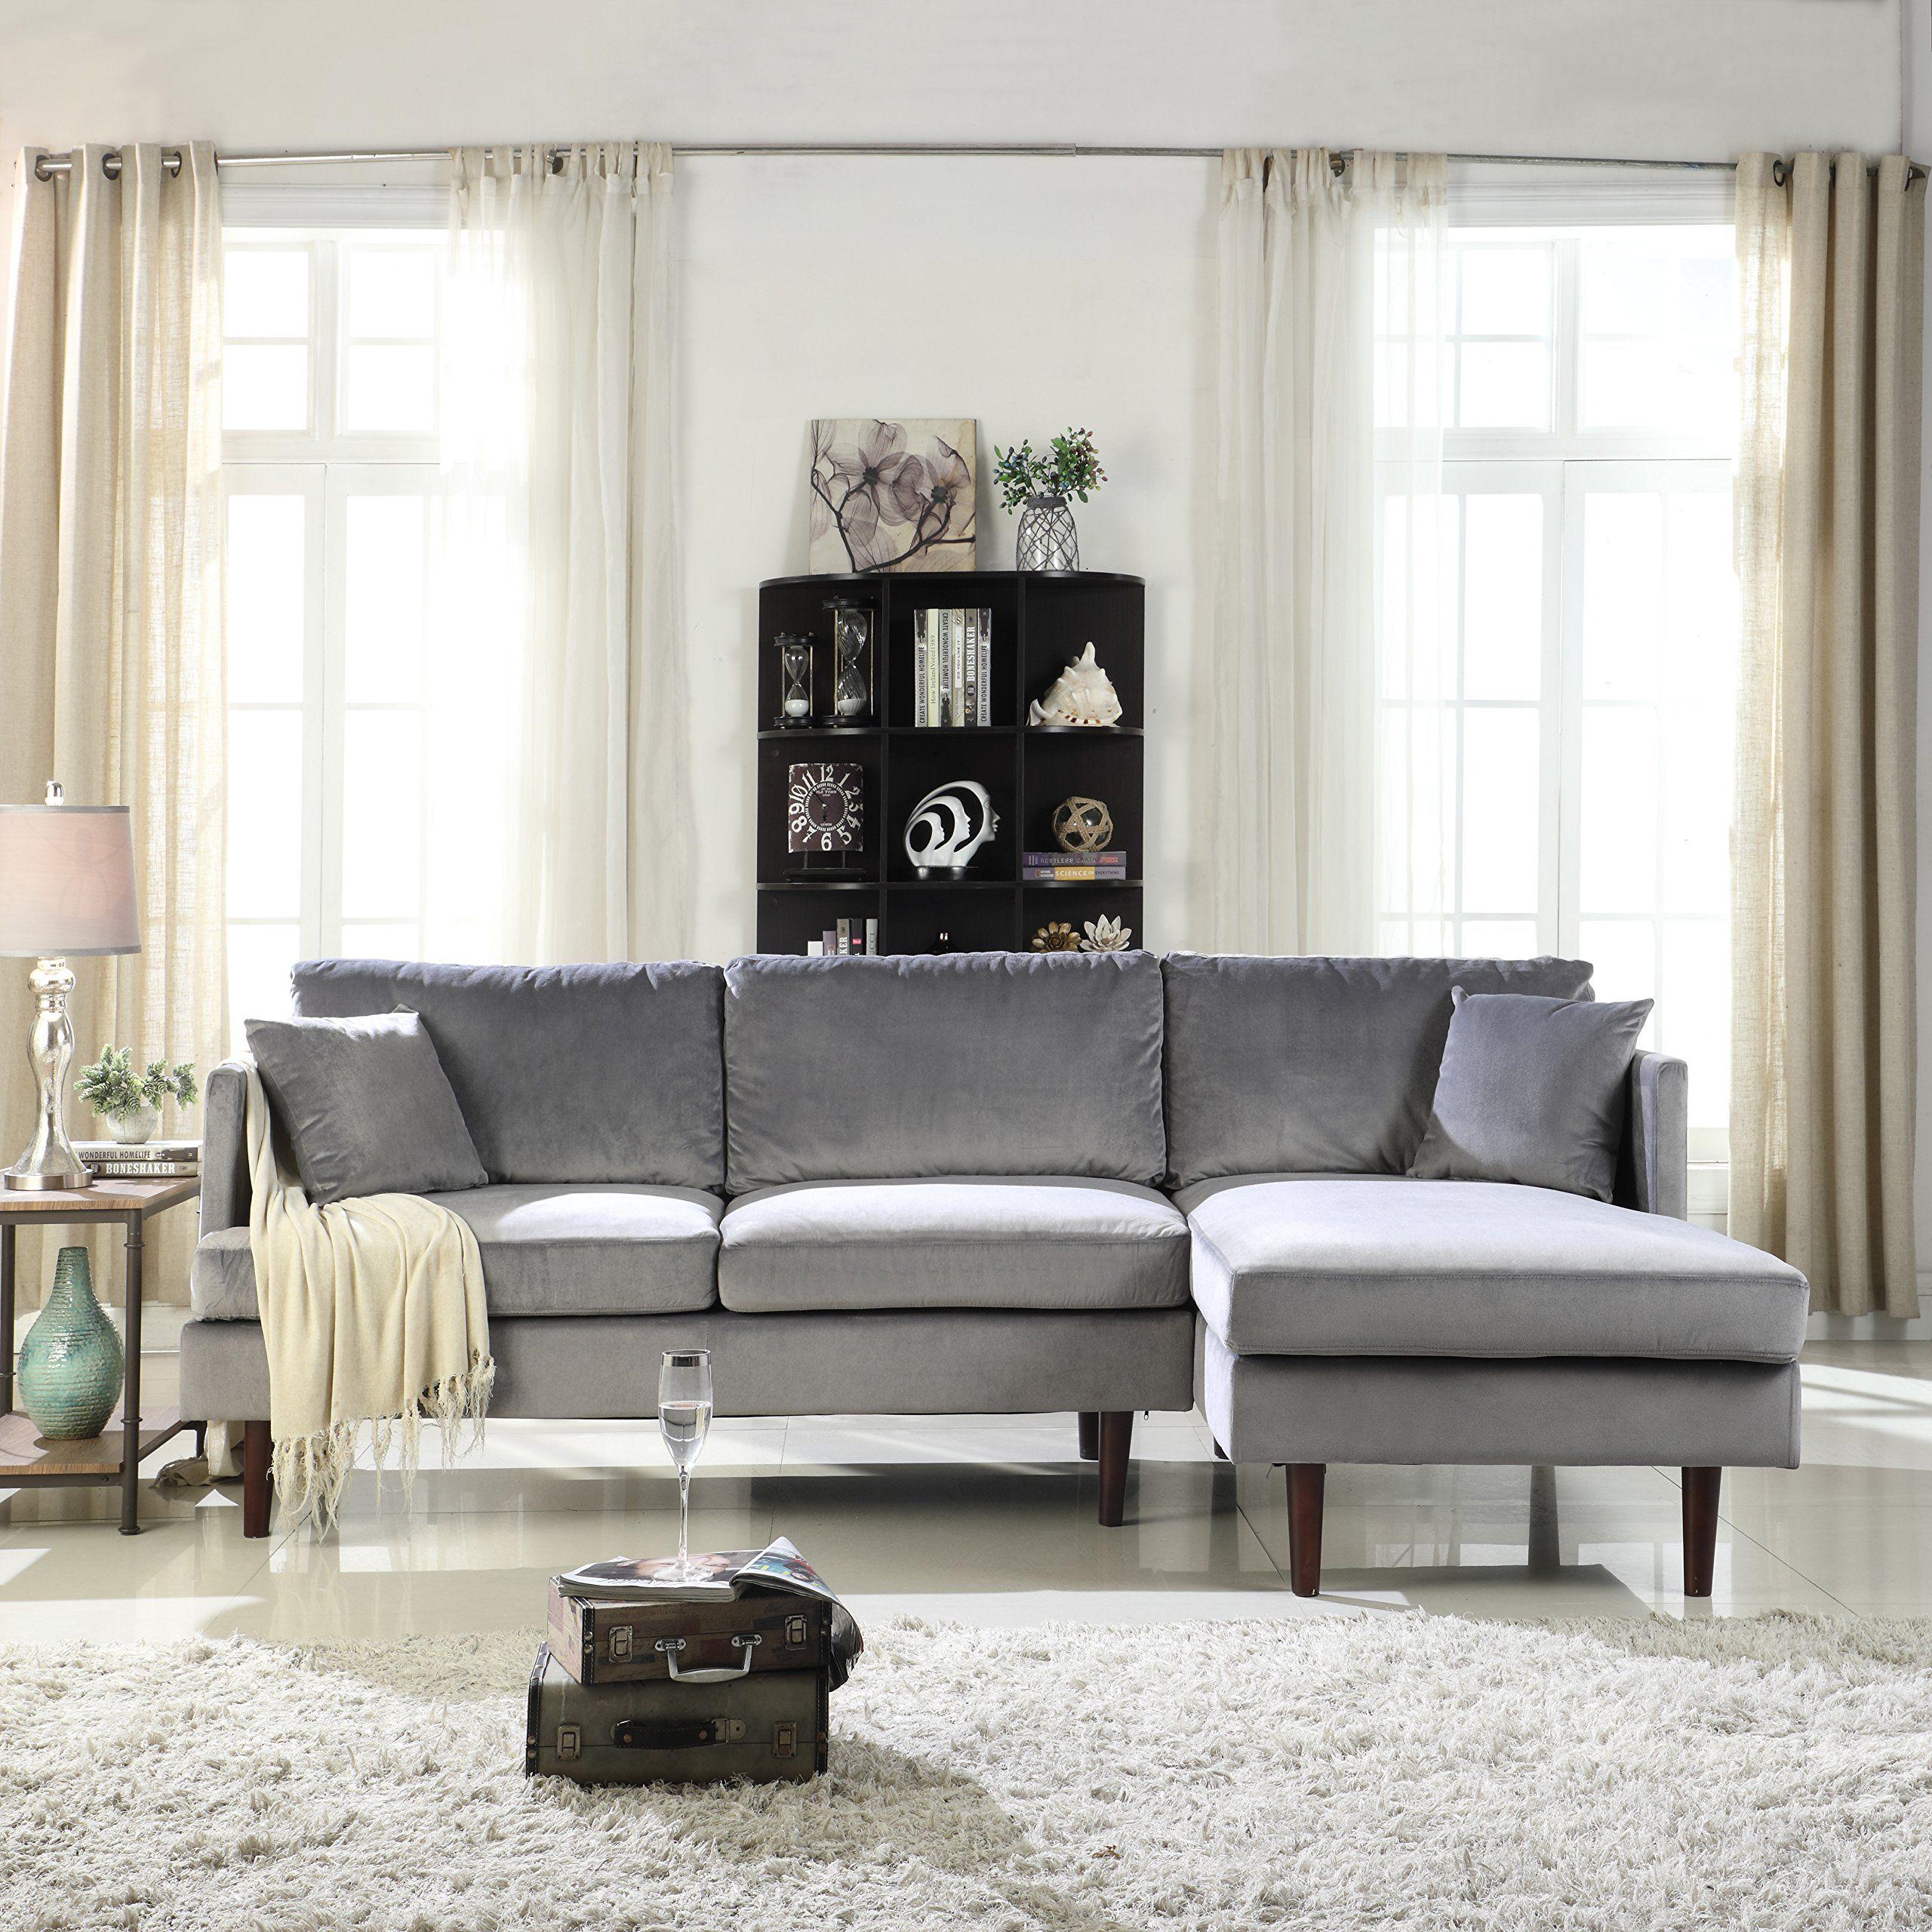 Sofamania Mid Century Modern Brush Microfiber Sectional Sofa L